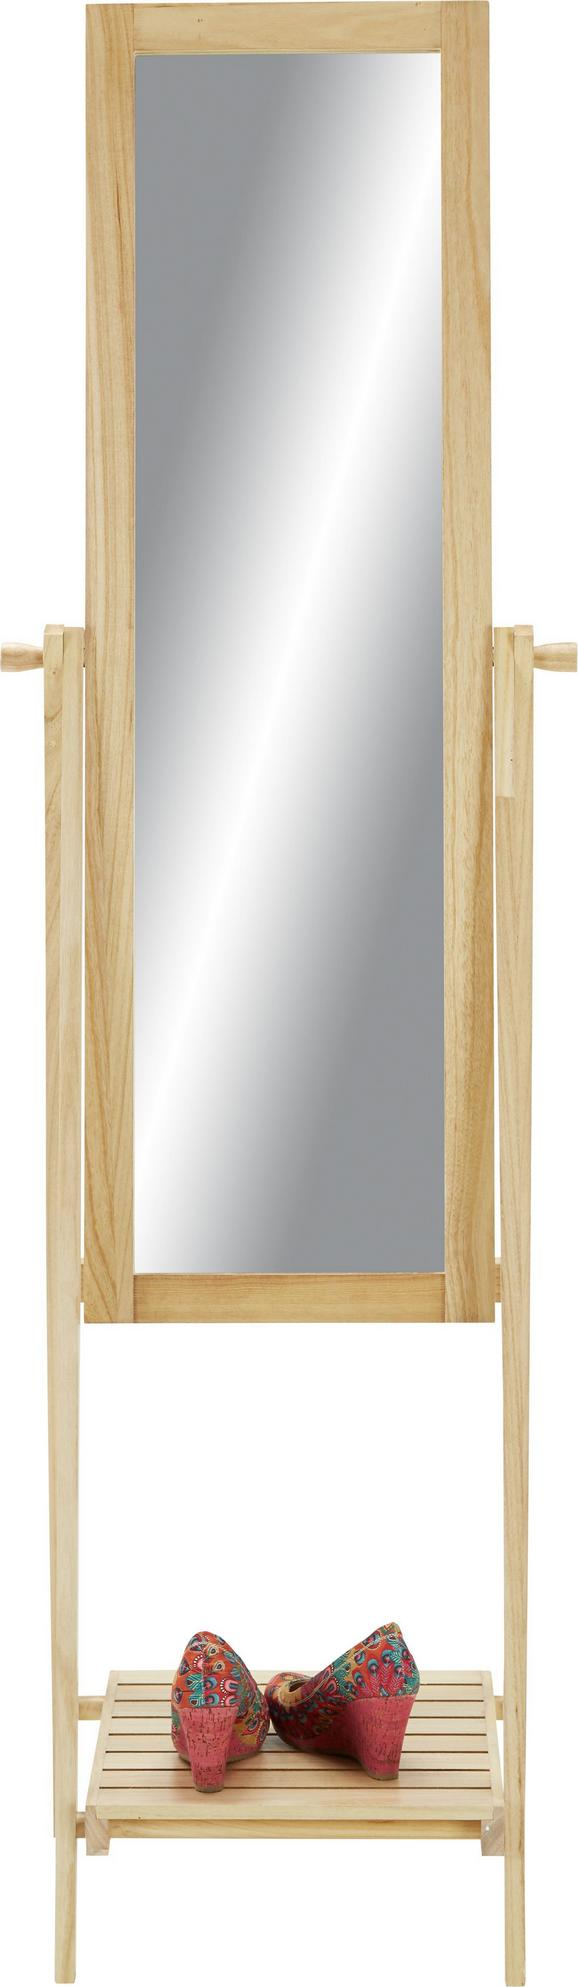 Standspiegel in Naturfarben - Naturfarben, MODERN, Glas/Holz (52/174/48cm) - Mömax modern living